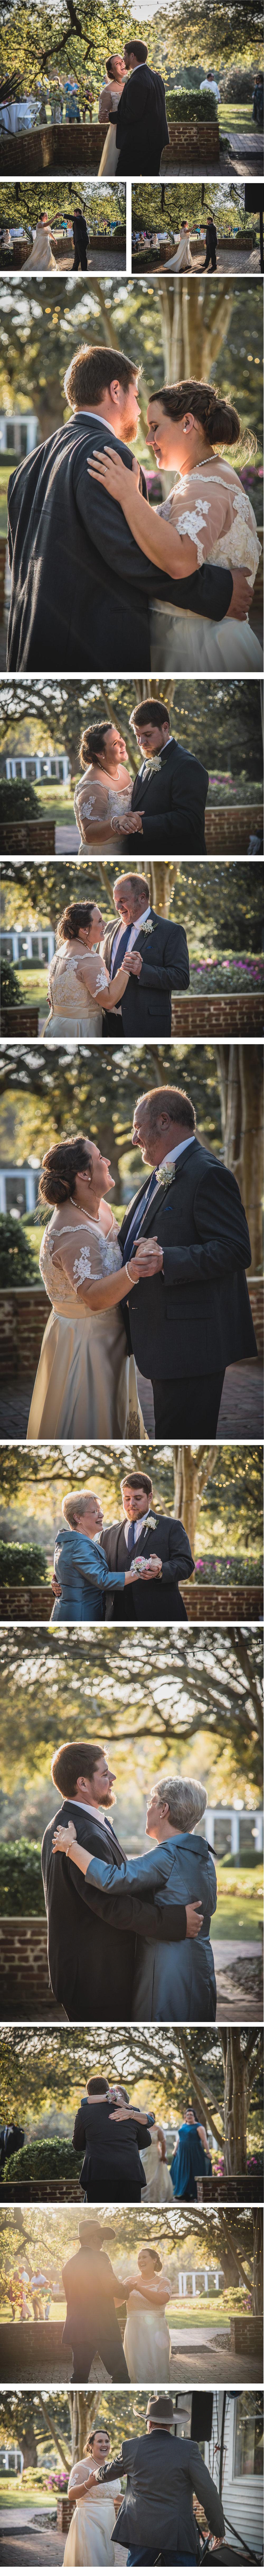 Hopelands Gardens Wedding Photographer Aiken South Carolina Wedding Venue